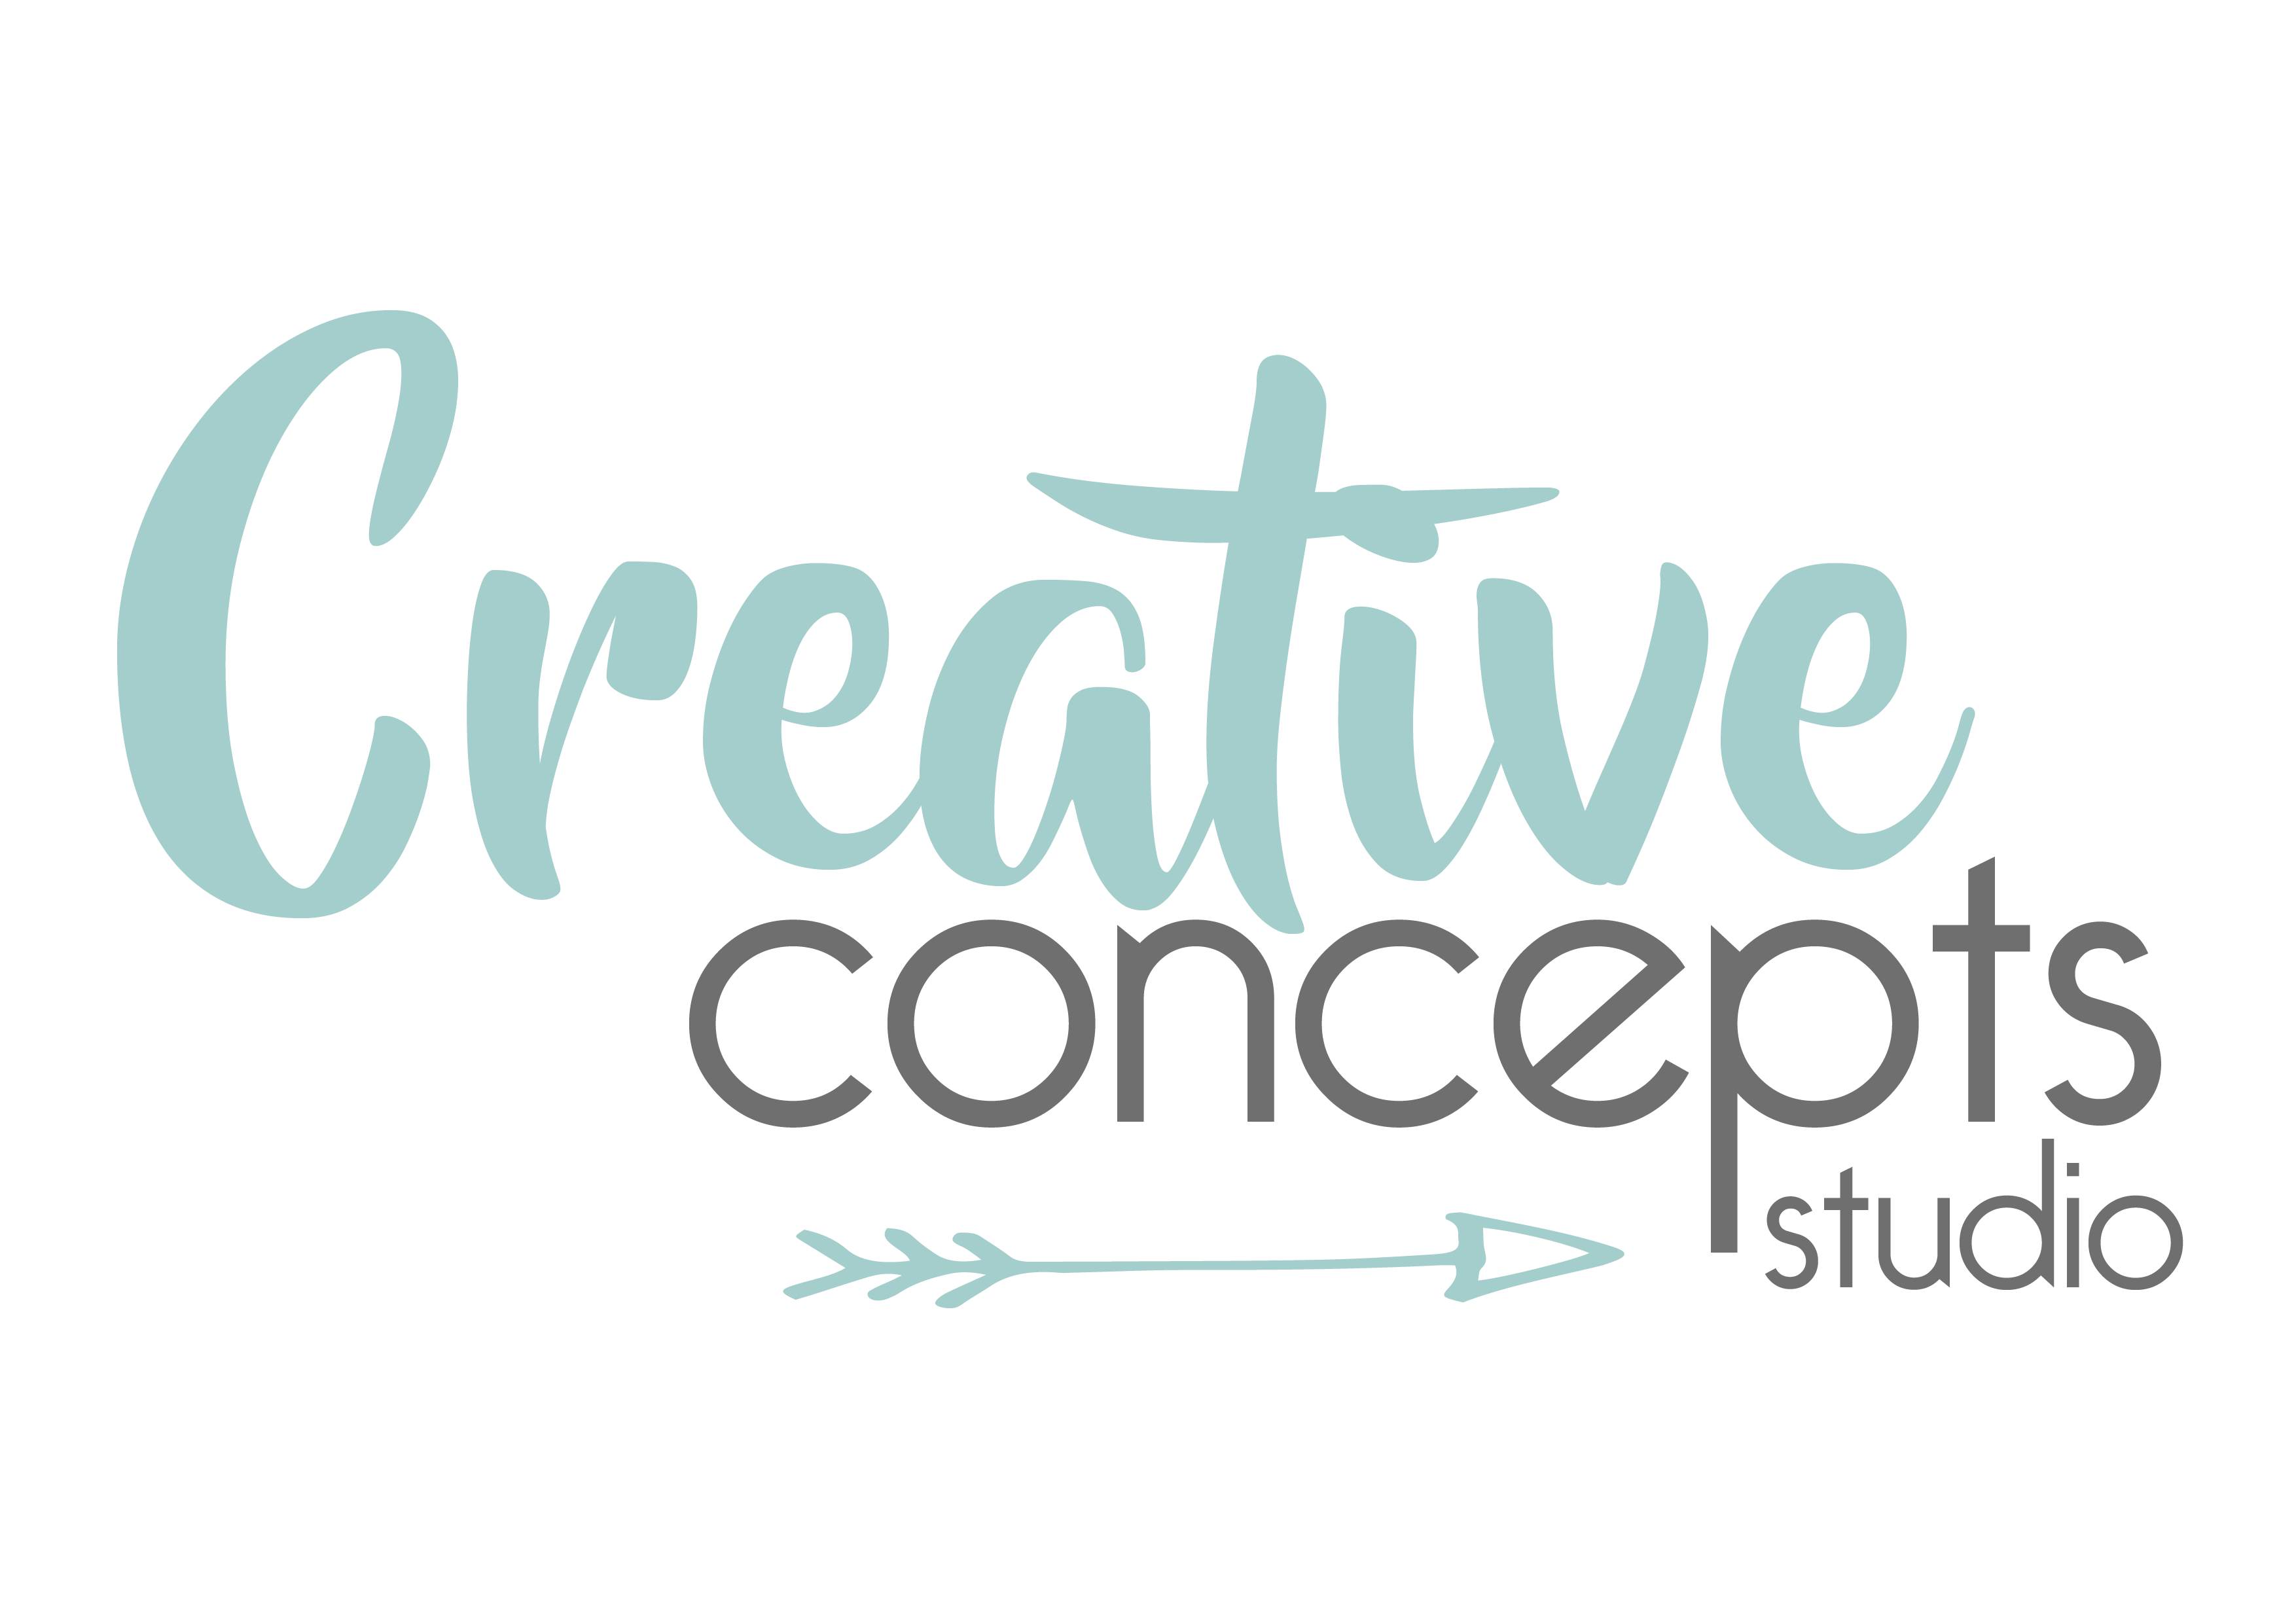 Creative Concept Studio